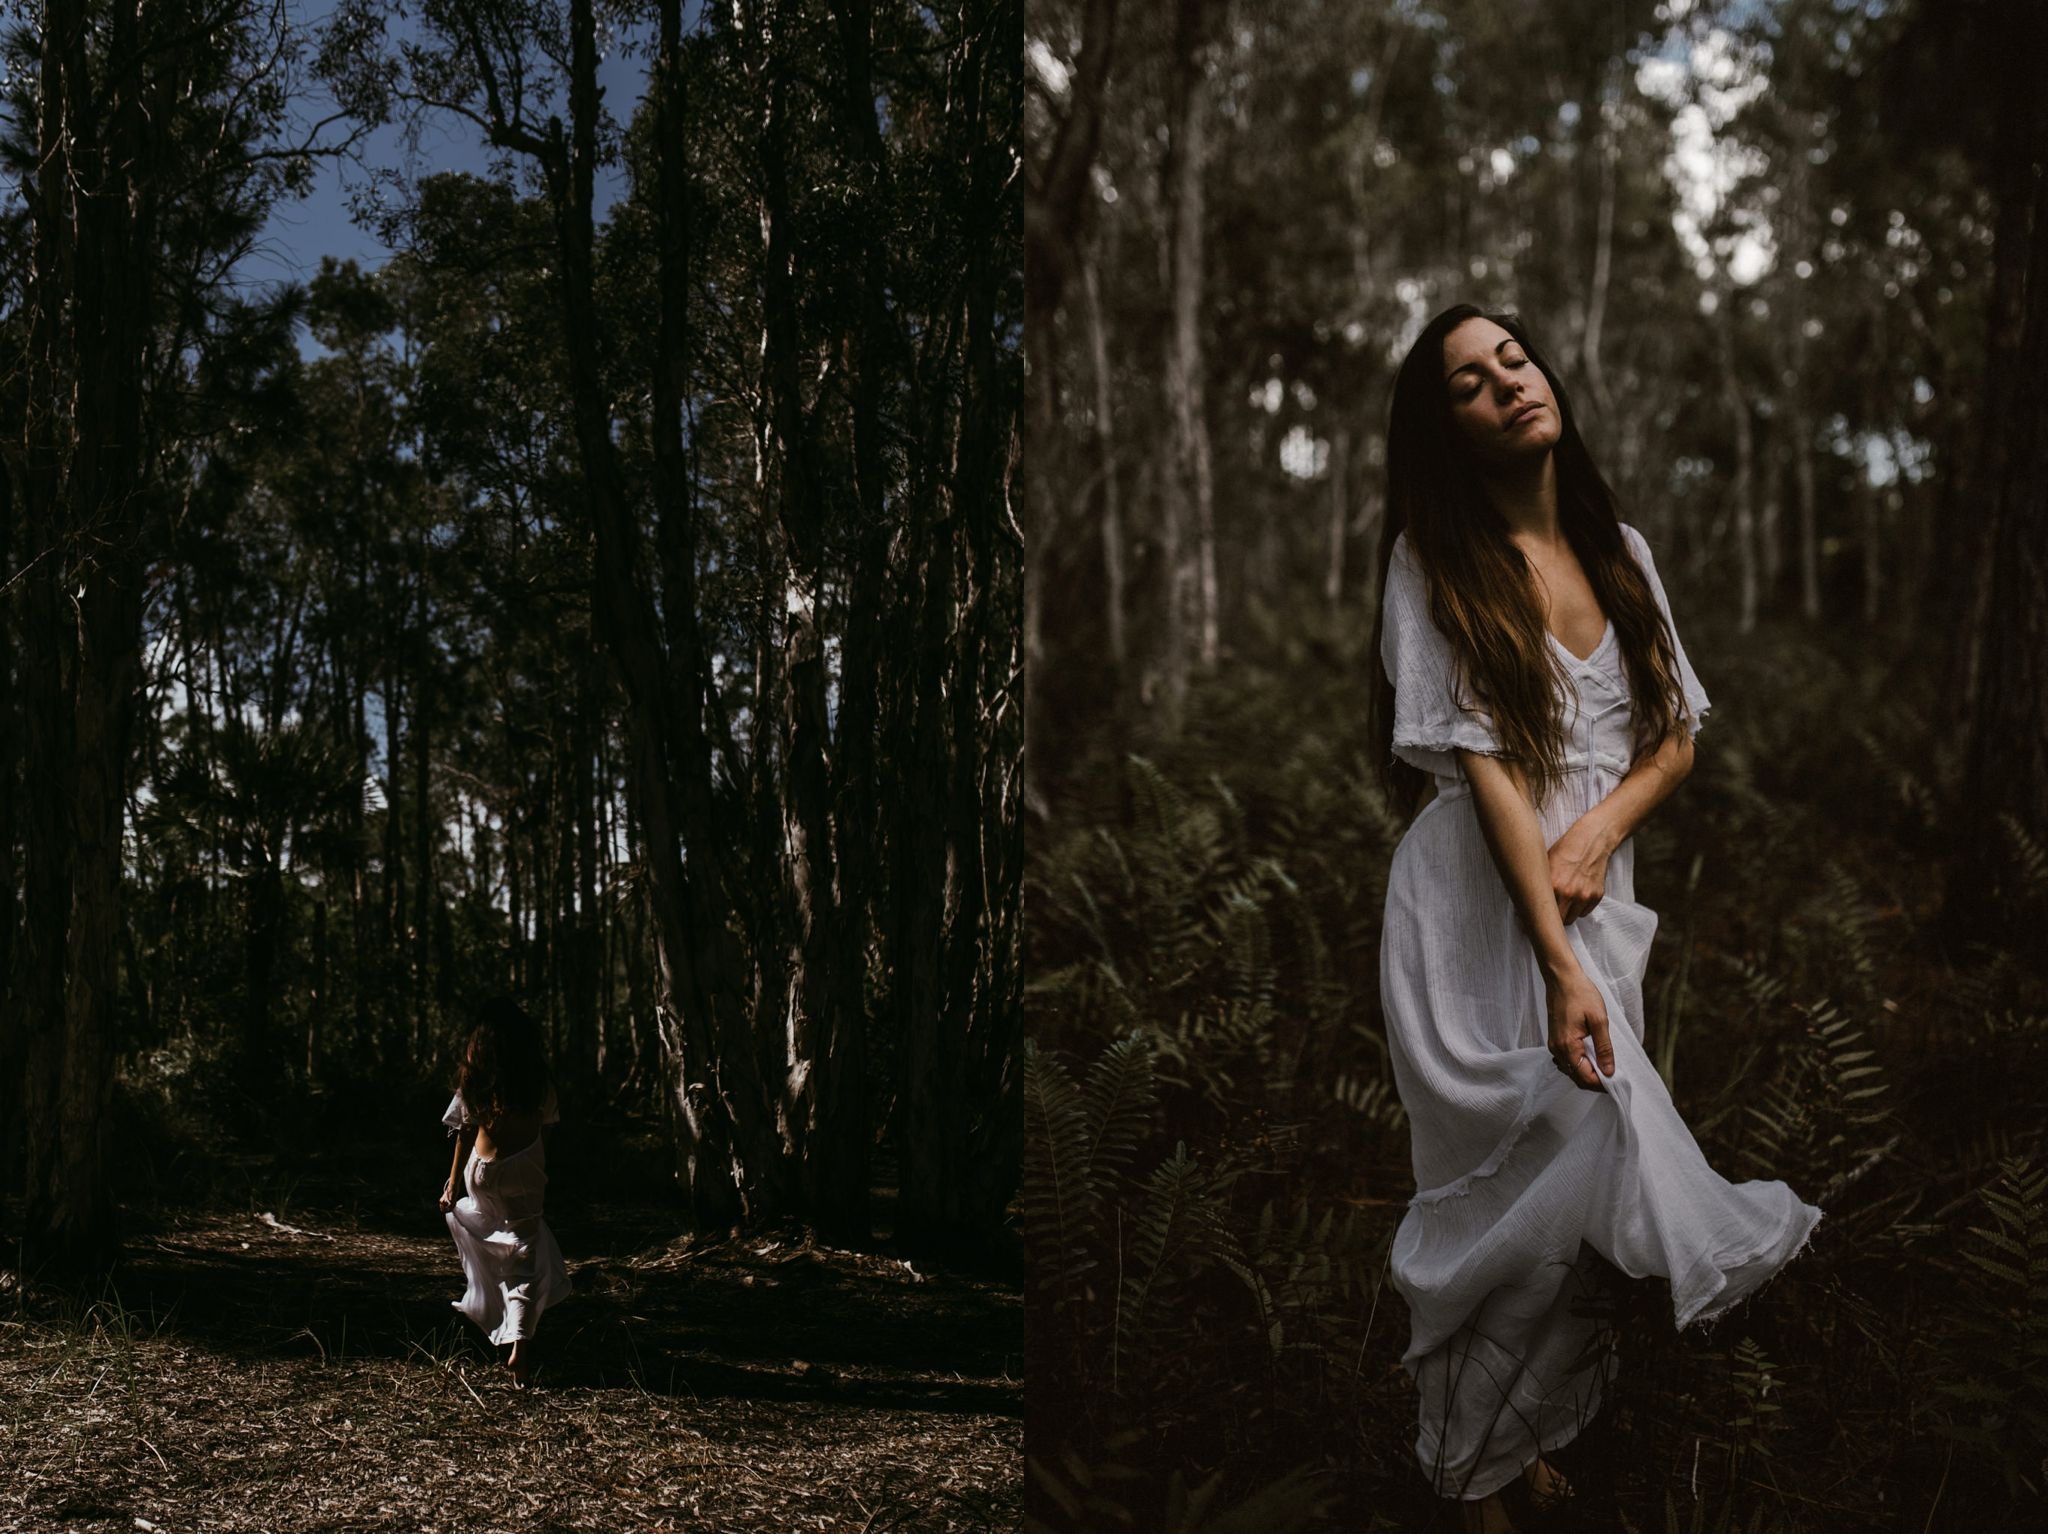 twyla jones photography - traveling dress--2_treasure coast florida.jpg